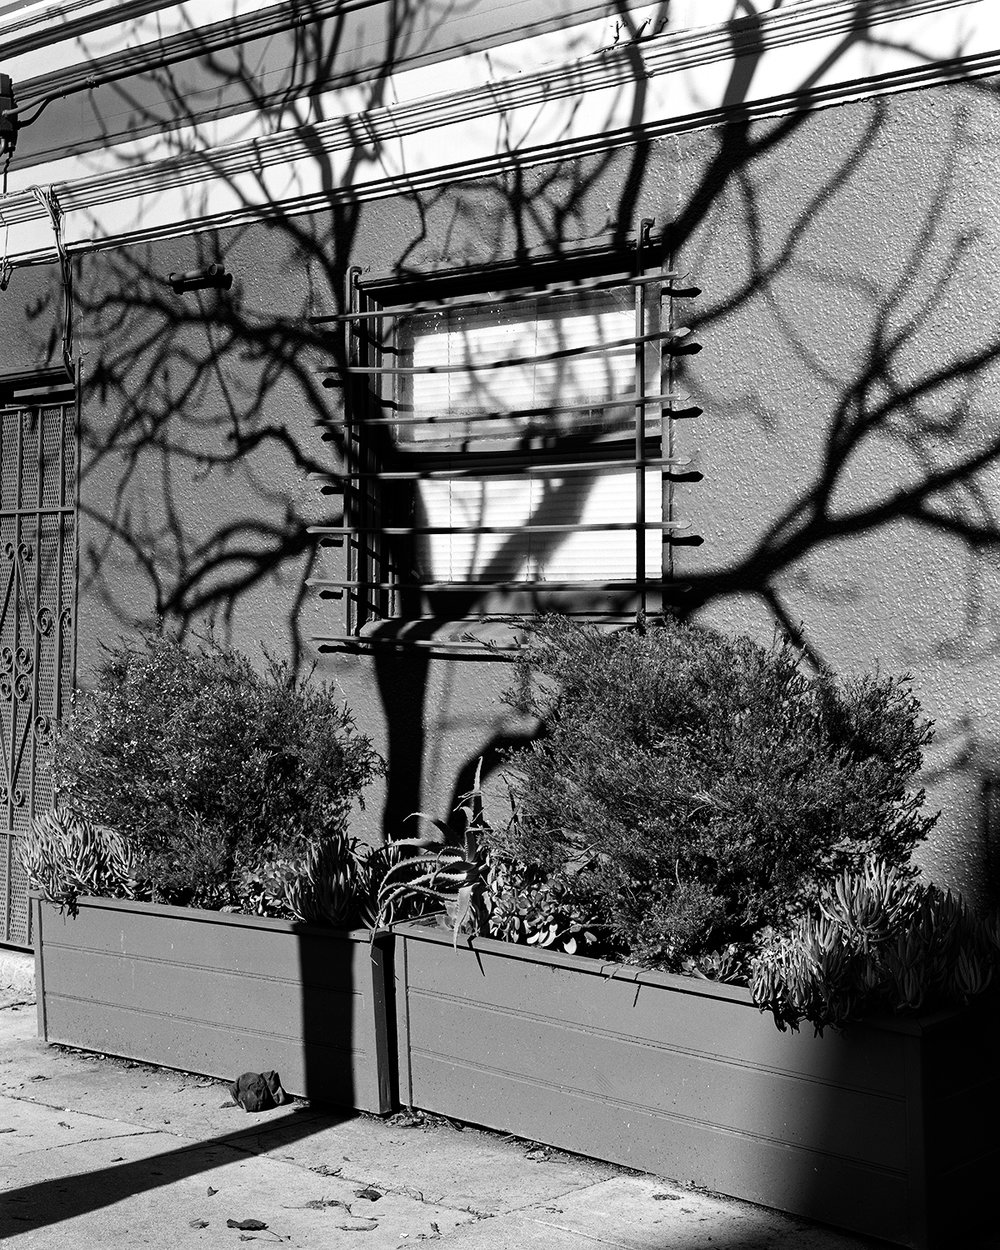 Tree Shadow, Lower Haight, San Francisco 2017